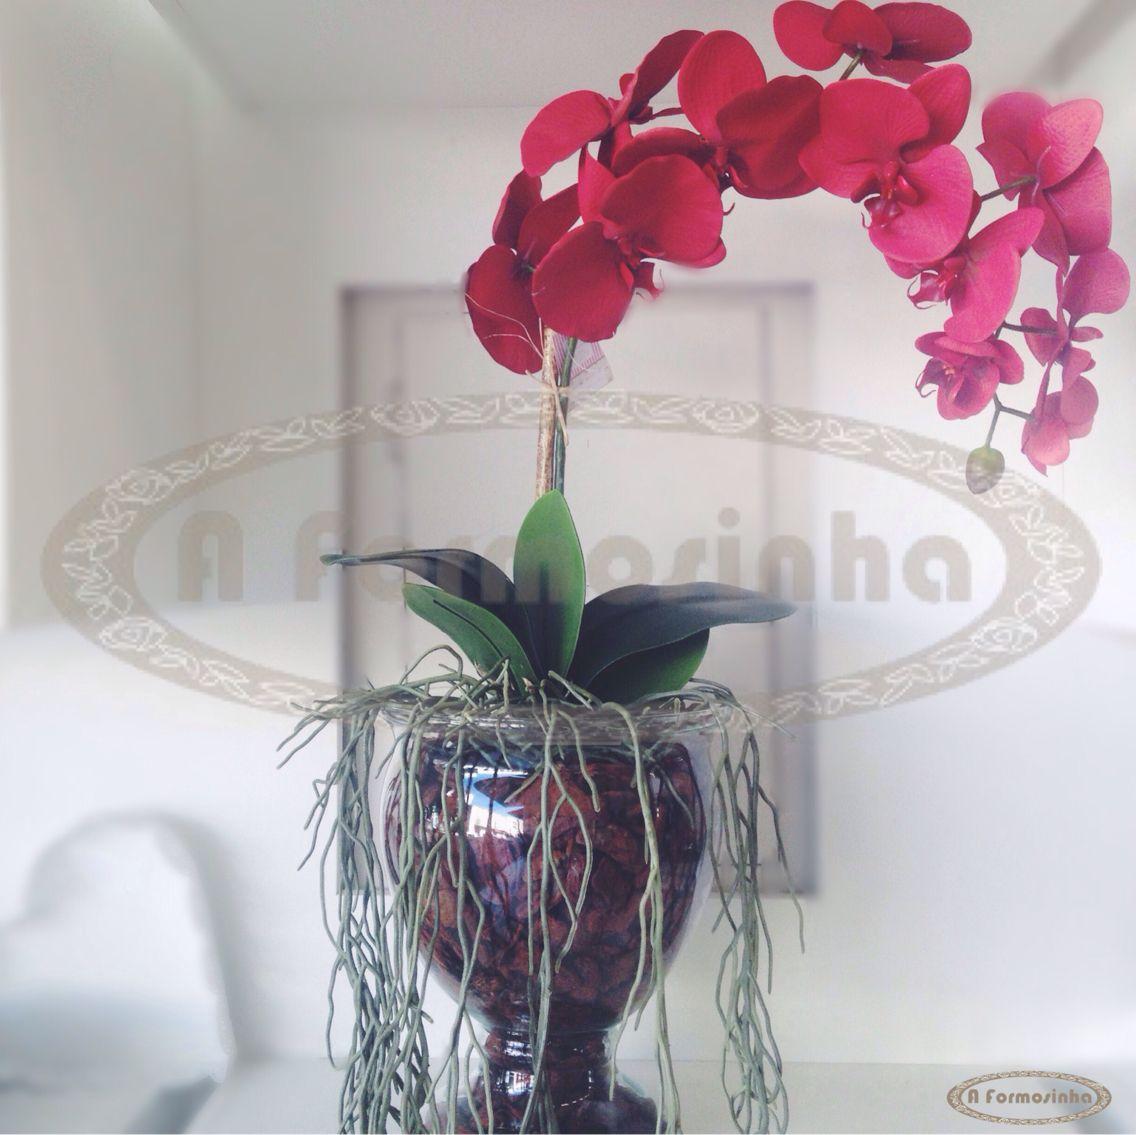 Orquideas Permanentes Para Arranjos De Canto Maravilhosas No